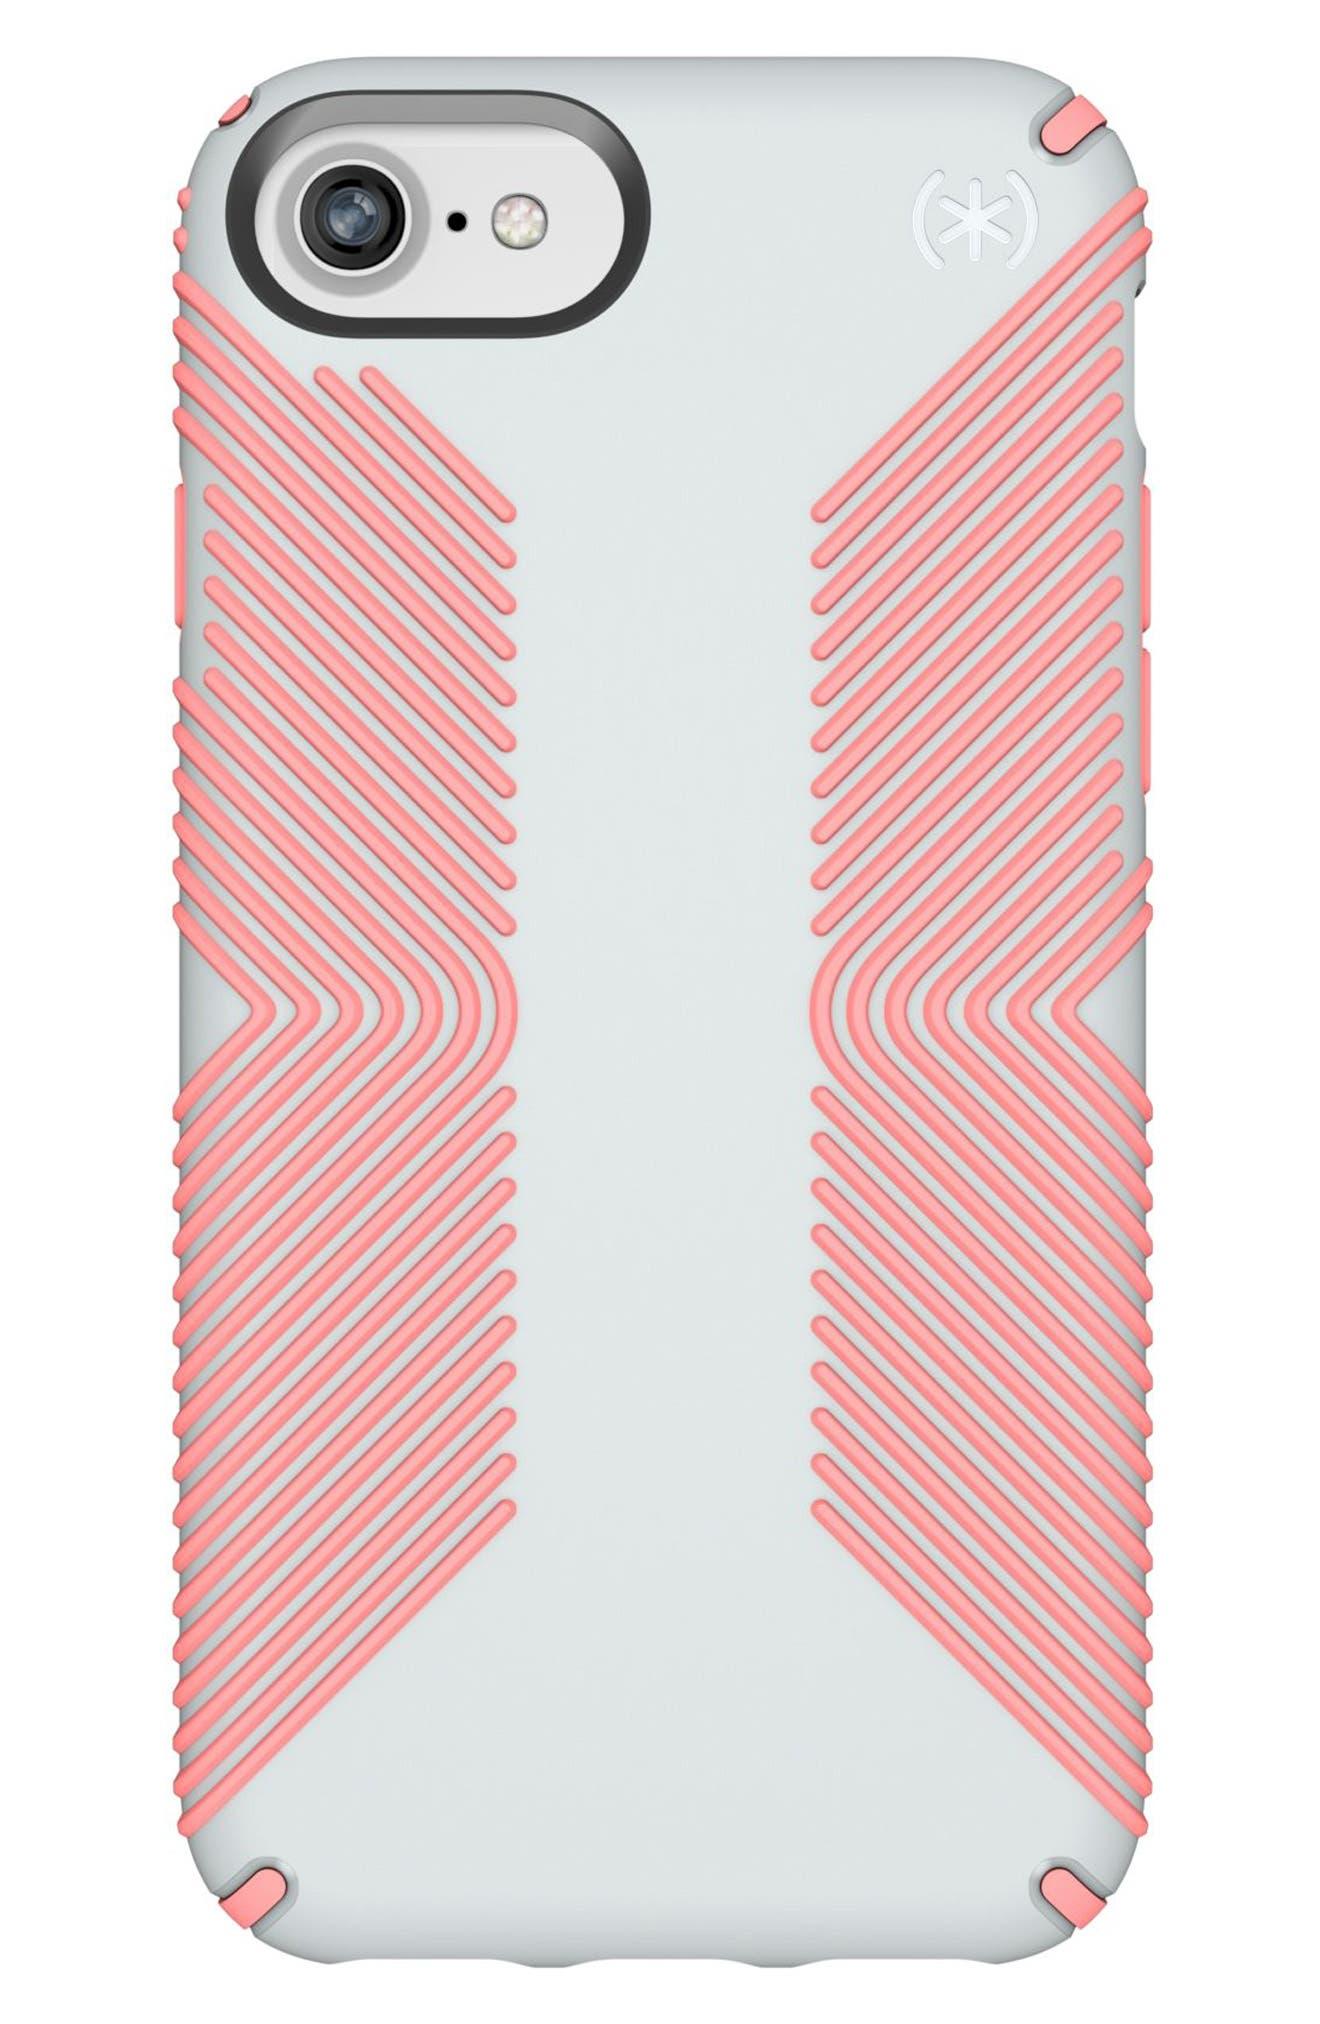 Main Image - Speck Grip iPhone 6/6s/7/8 Case